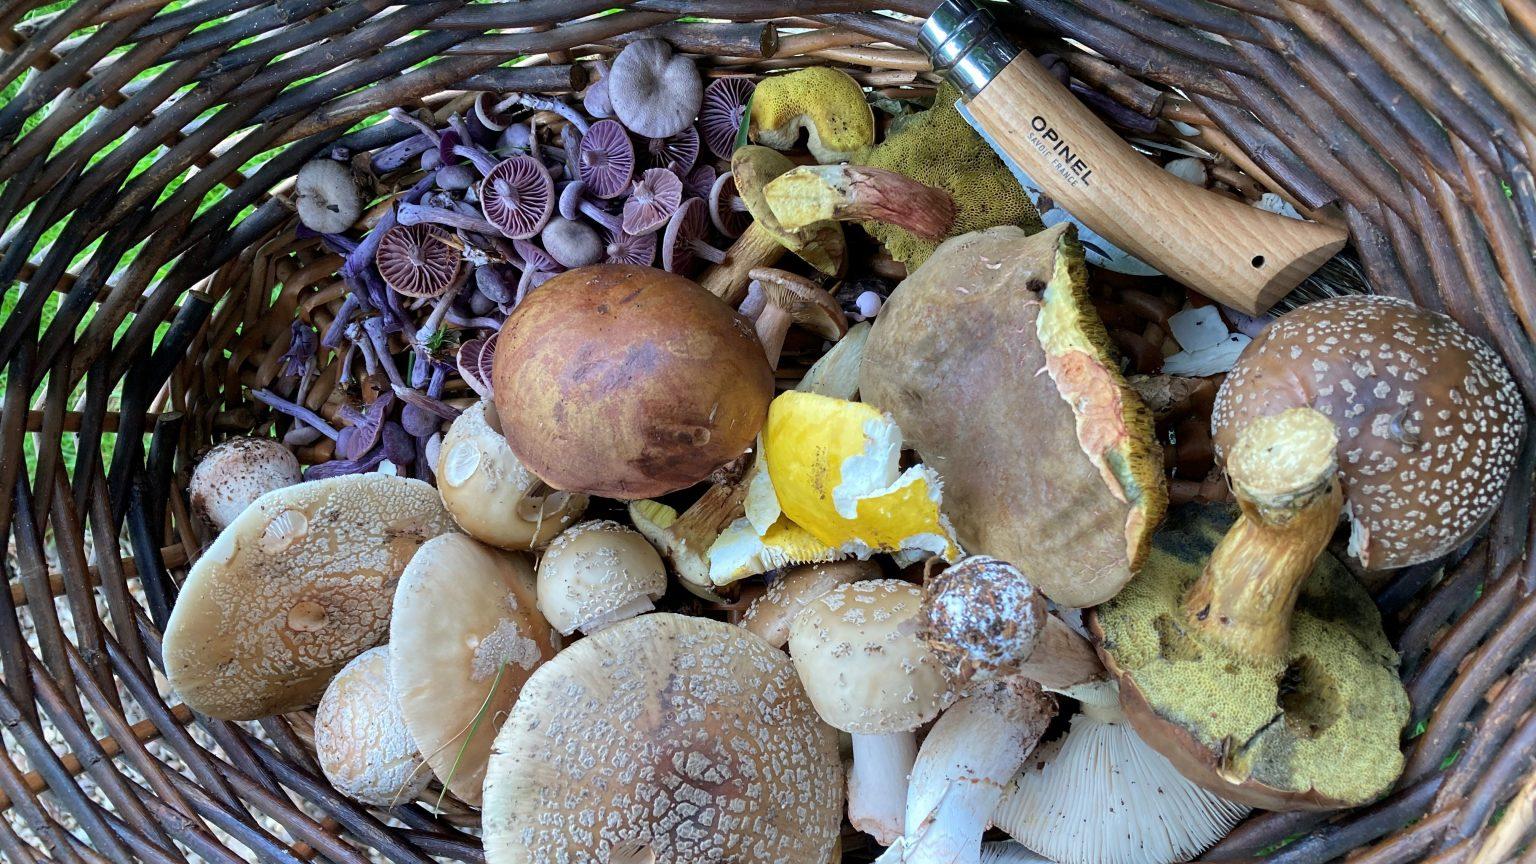 Mushrooms pic 2